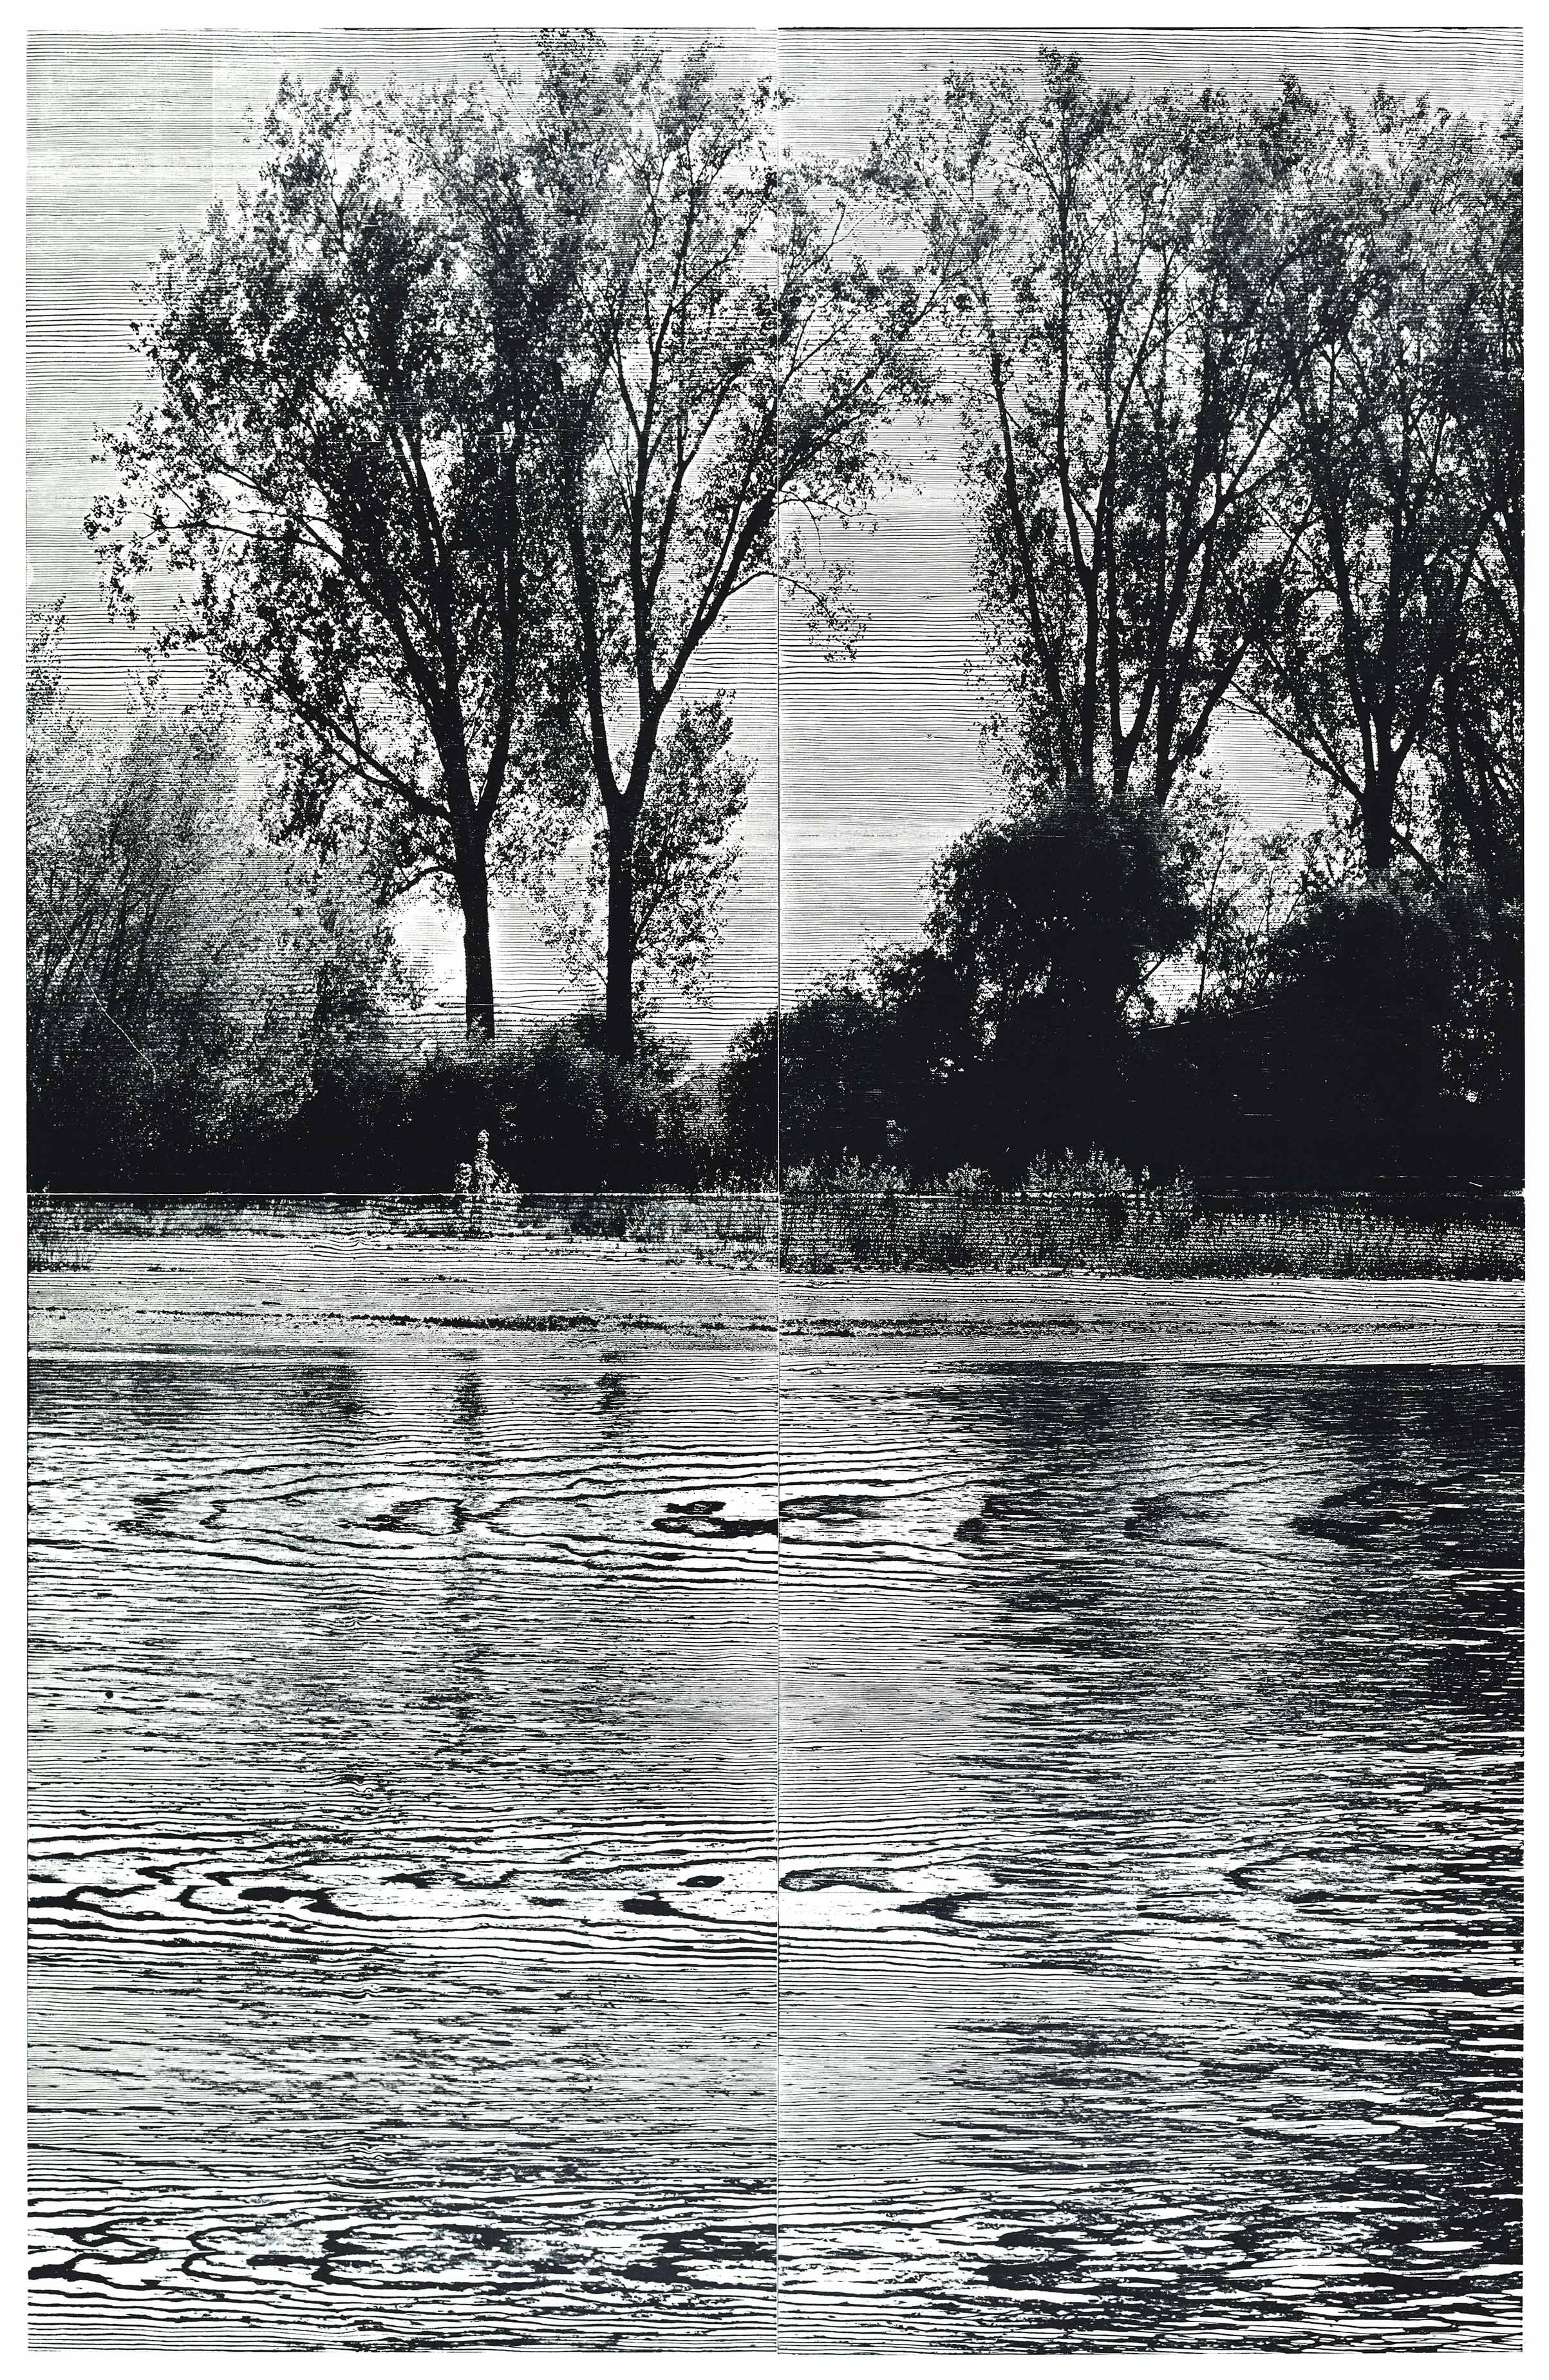 """Rhein III""; woodcut, laserphotography; 184,8x120,3cm; 2018 Genaro Strobel"